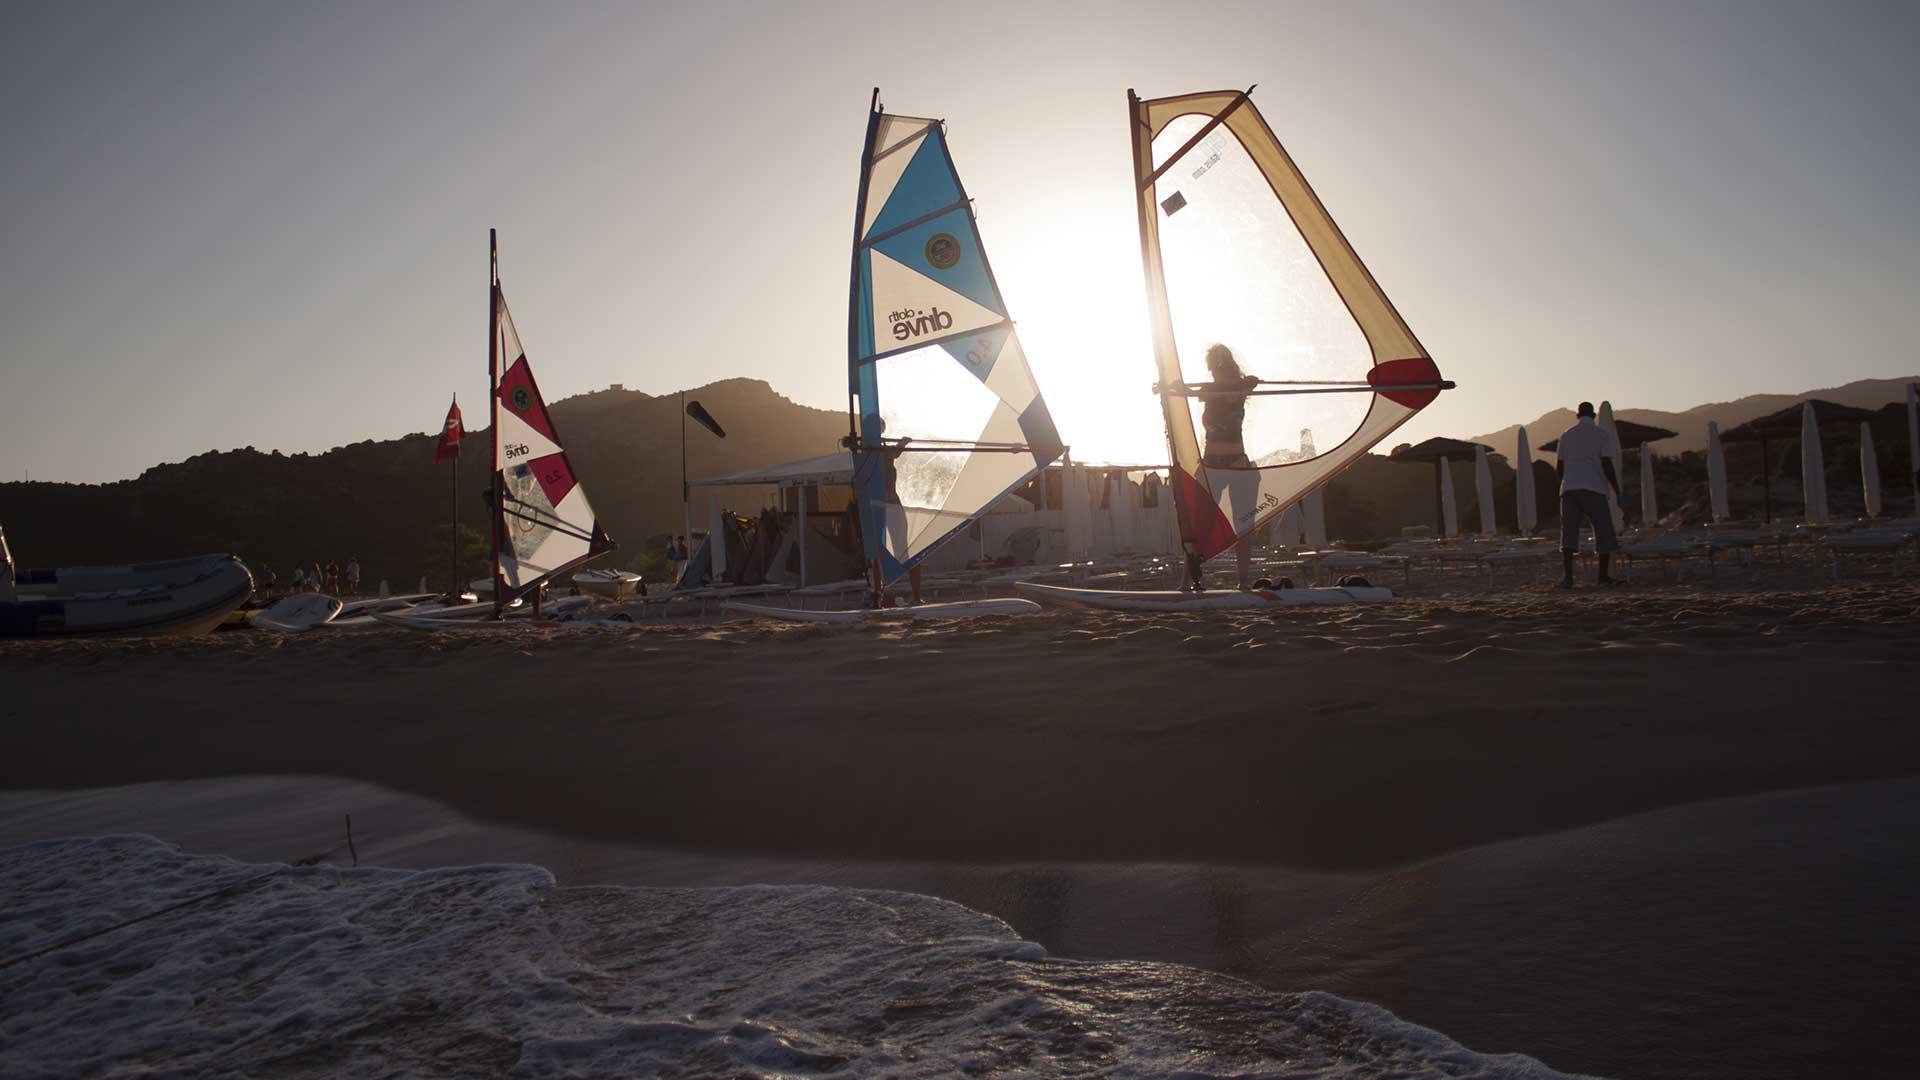 Foto-Windsurf-tramonto-1920x1080